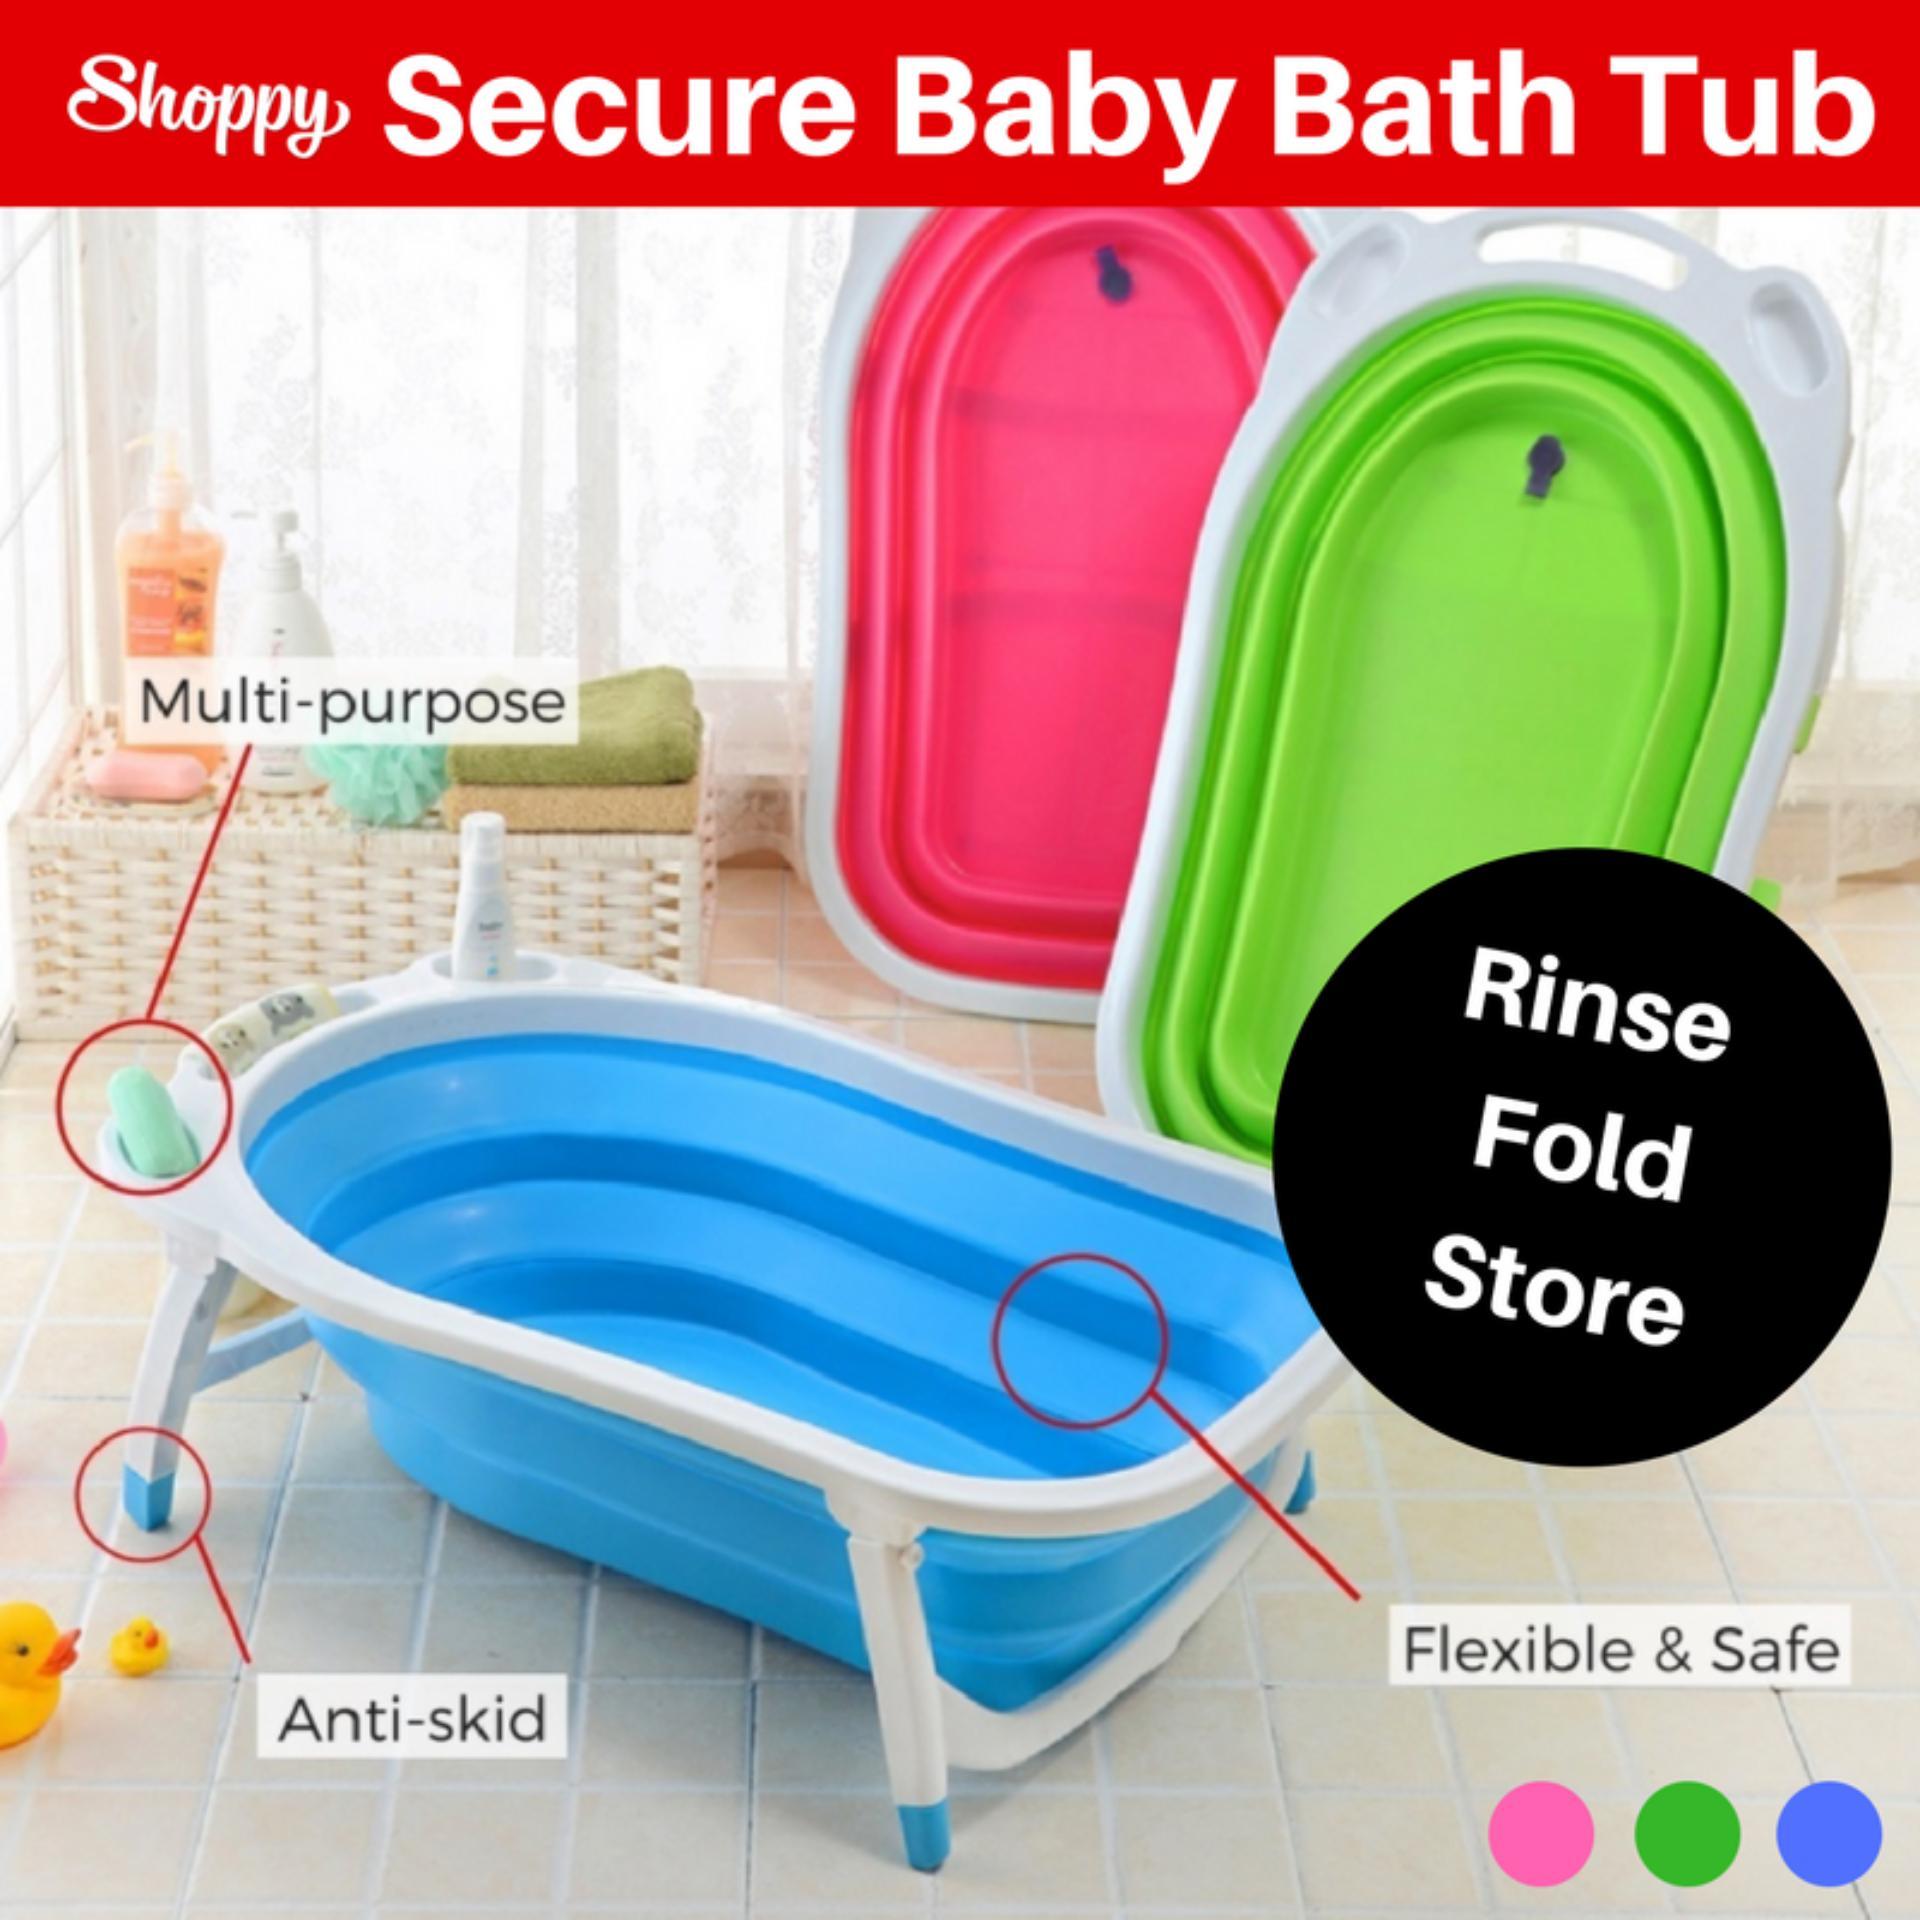 Shoppy Foldable Space Saving Secure Baby Bath Shower Tub Free Shipping